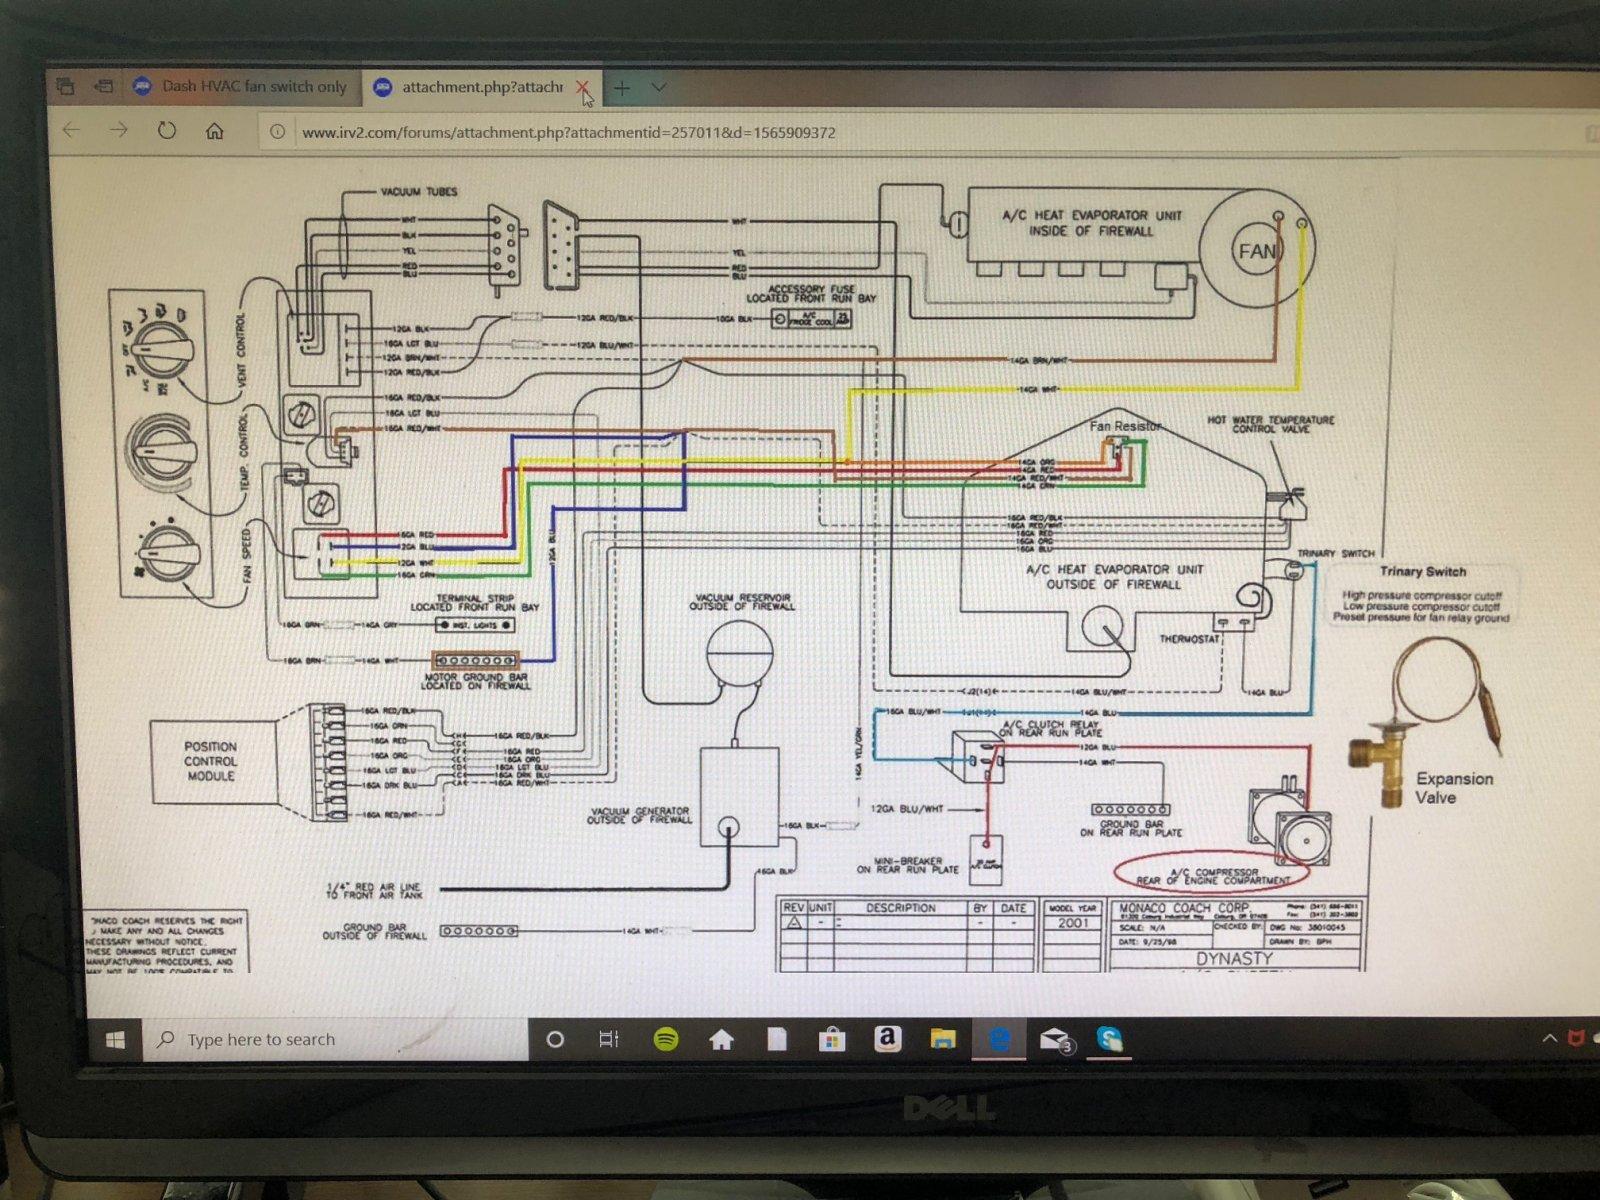 Monaco Rv Wiring Diagram from www.irv2.com